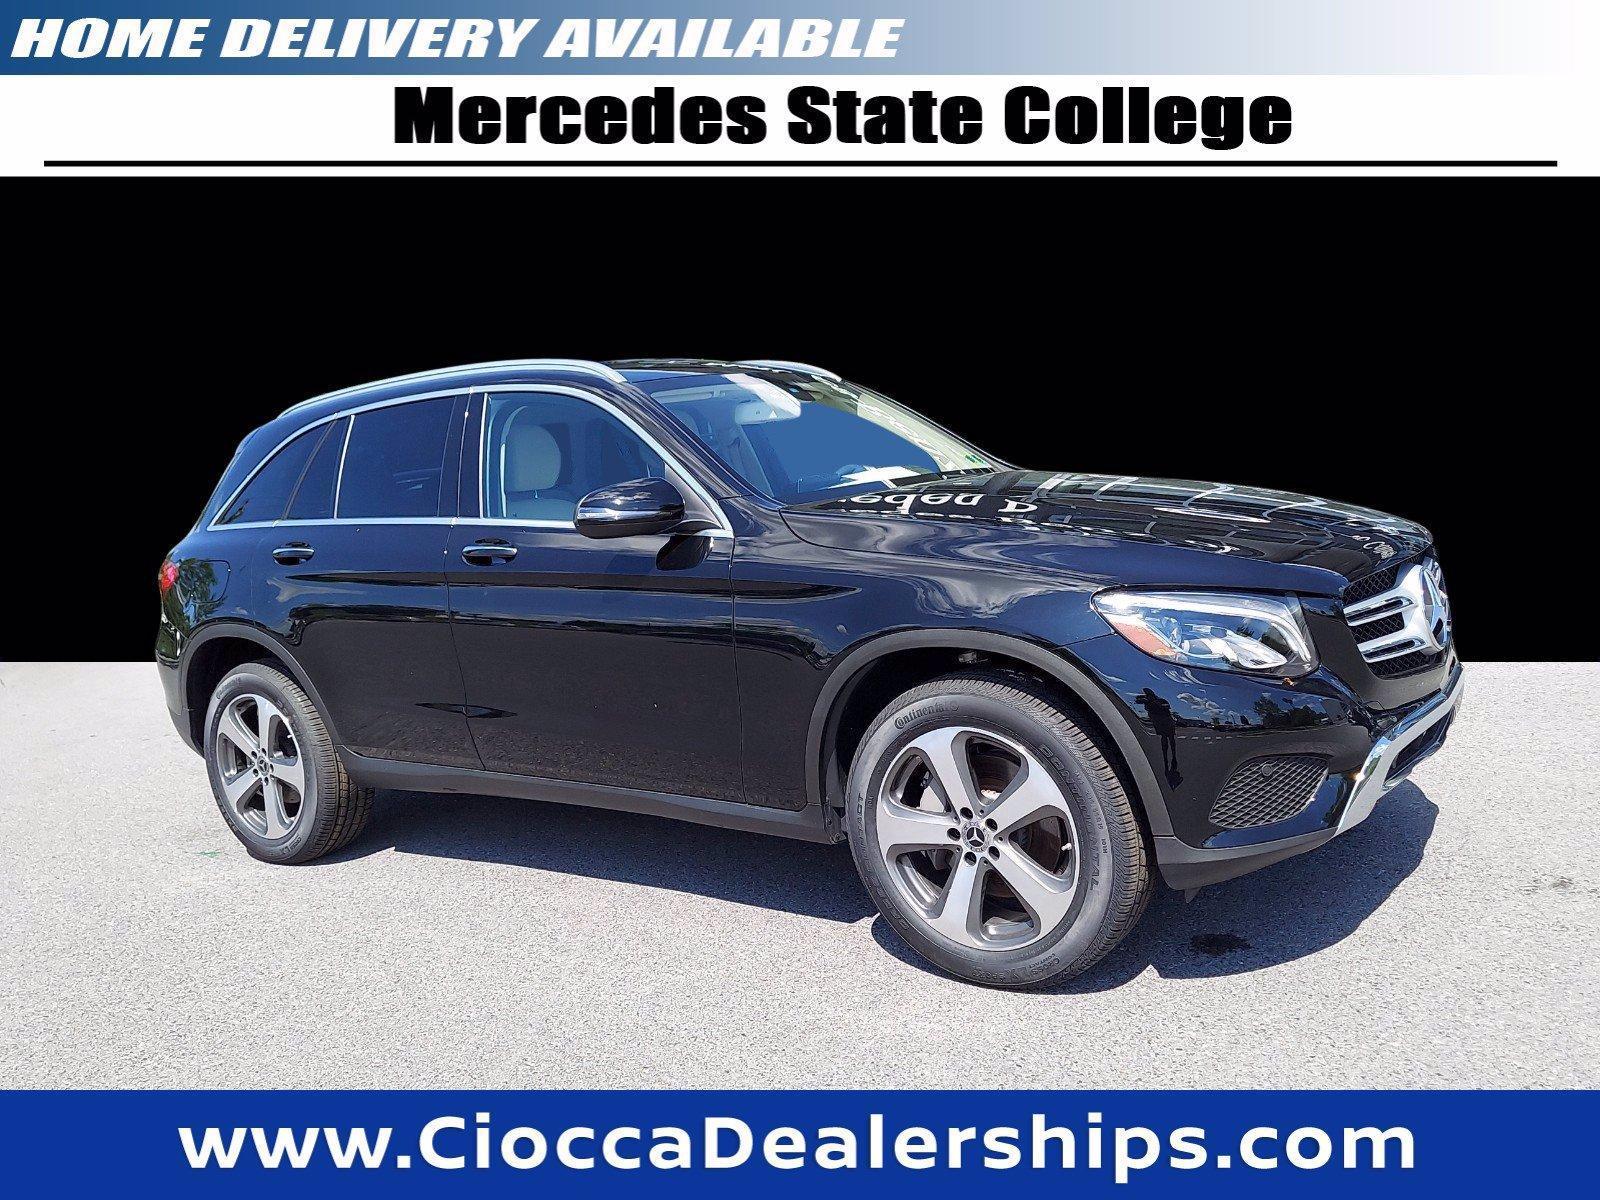 2019 Mercedes-Benz GLC Vehicle Photo in State College, PA 16801